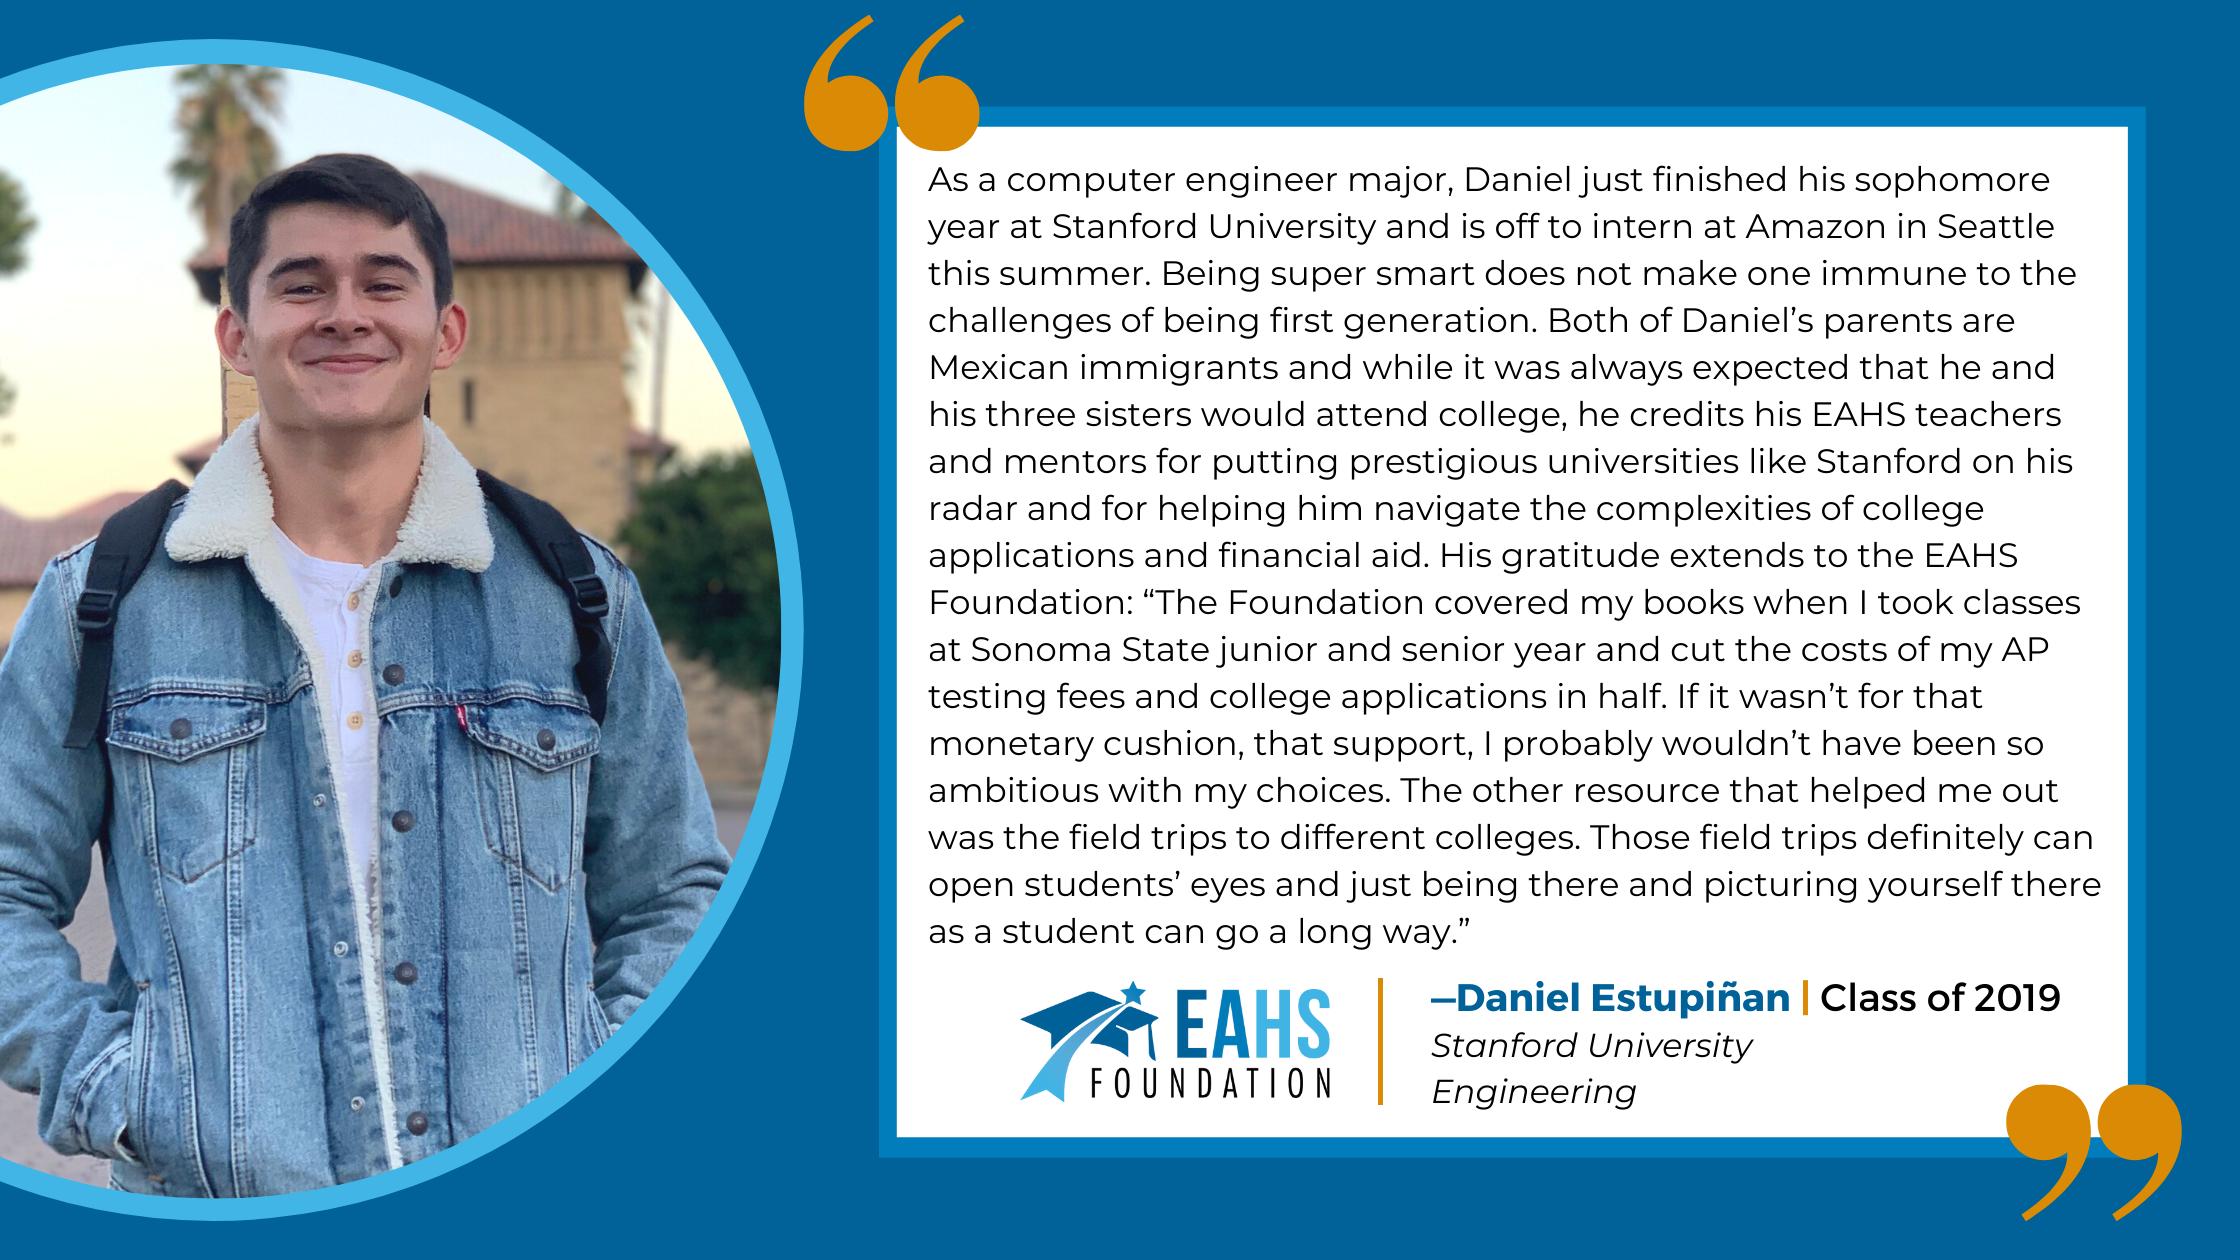 Alumni Spotlight -Daniel Estupiñan, EAHS Foundation